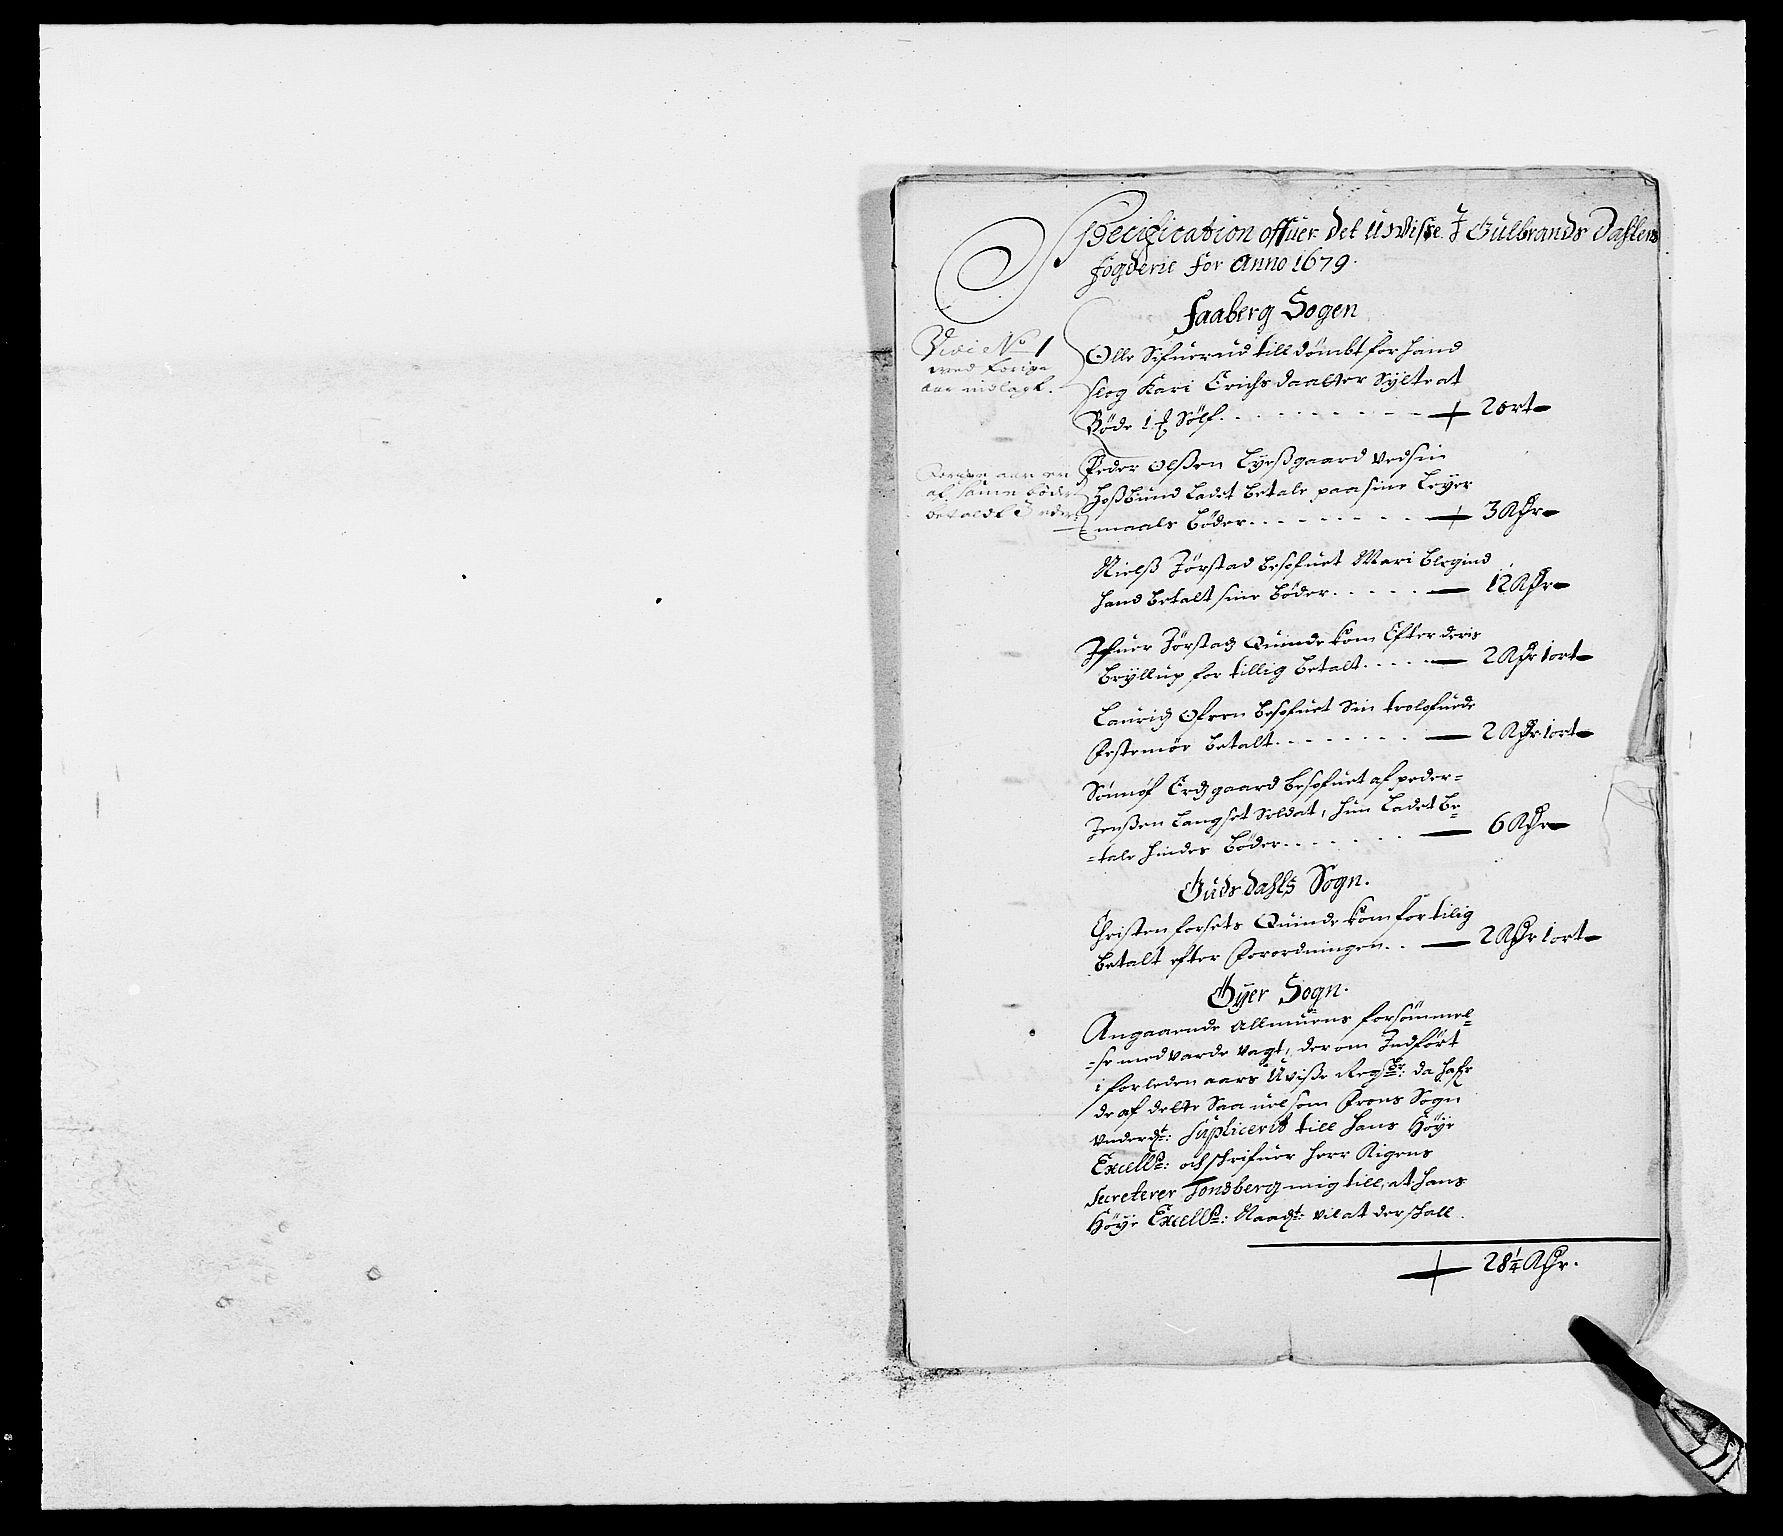 RA, Rentekammeret inntil 1814, Reviderte regnskaper, Fogderegnskap, R17/L1153: Fogderegnskap Gudbrandsdal, 1678-1679, s. 190